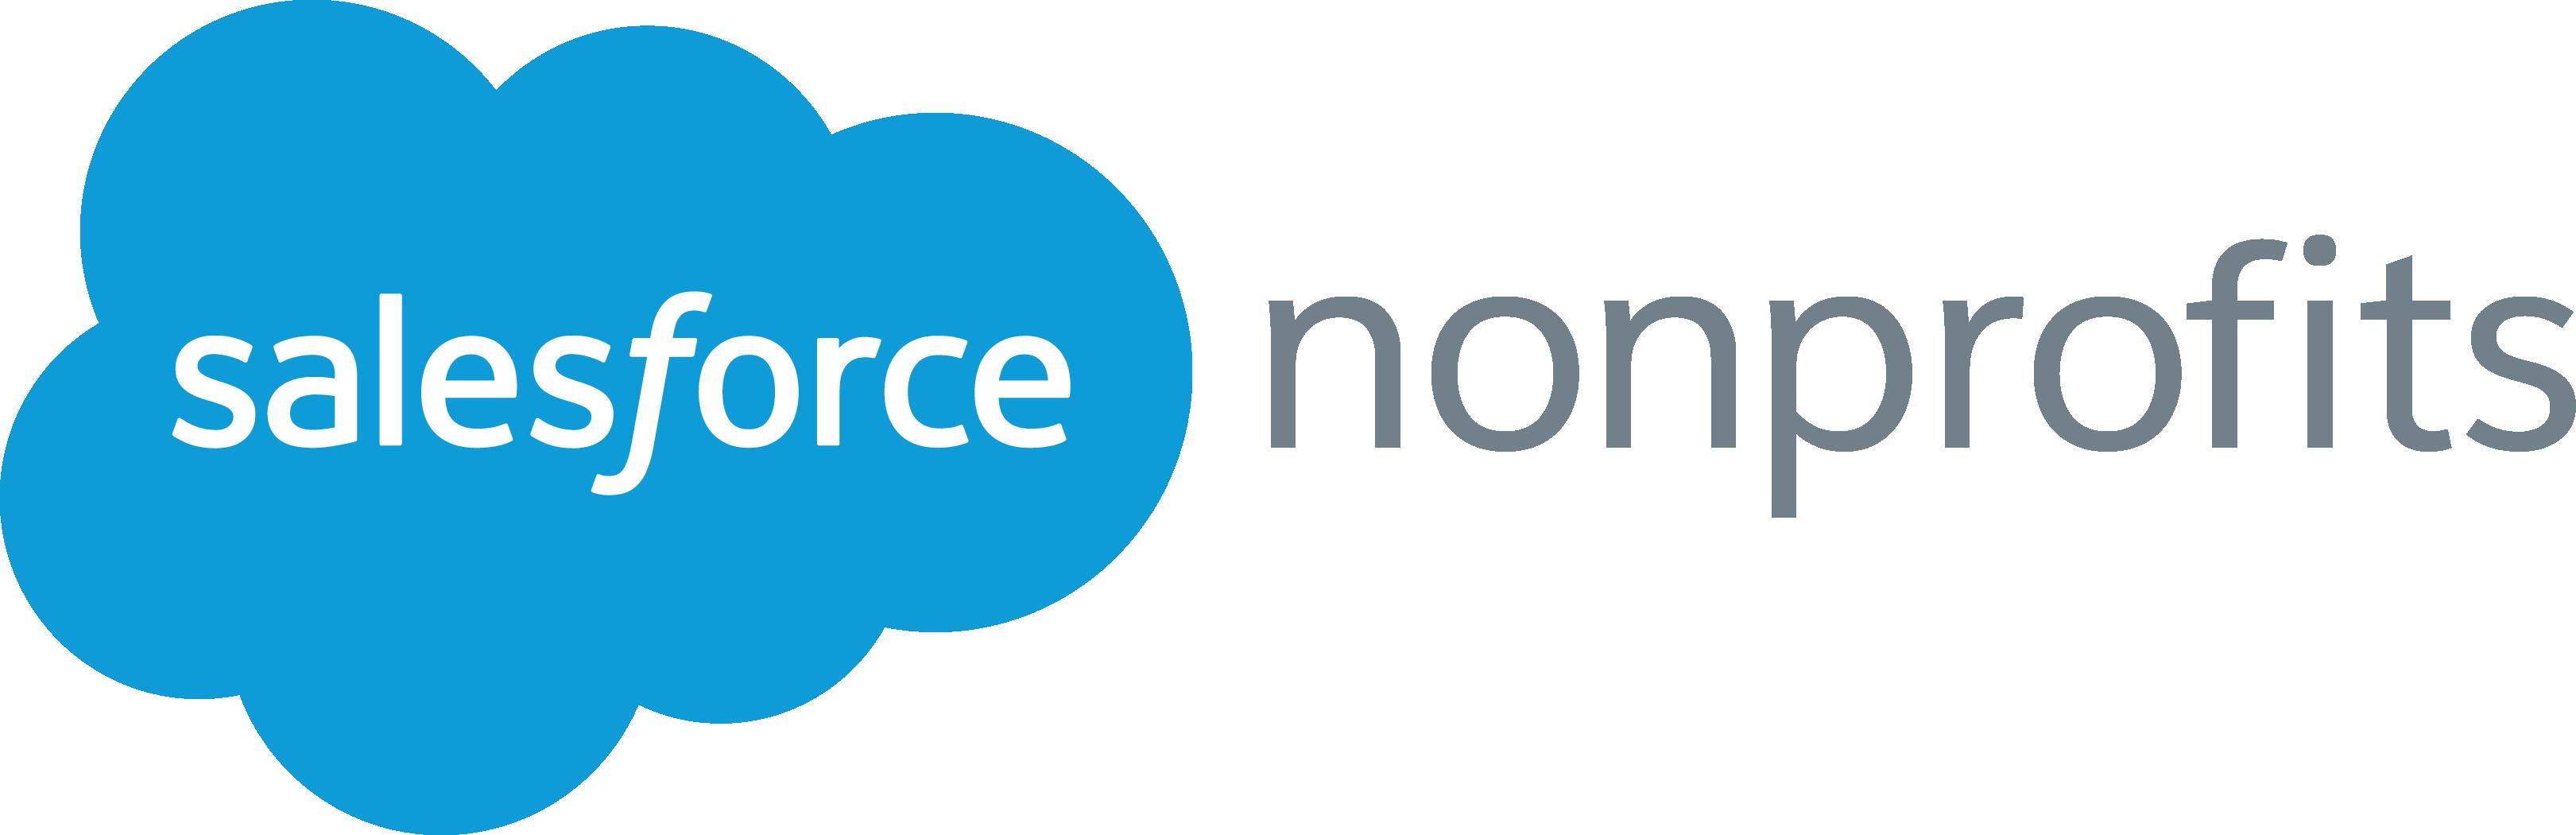 Salesforce for nonprofits success pack image